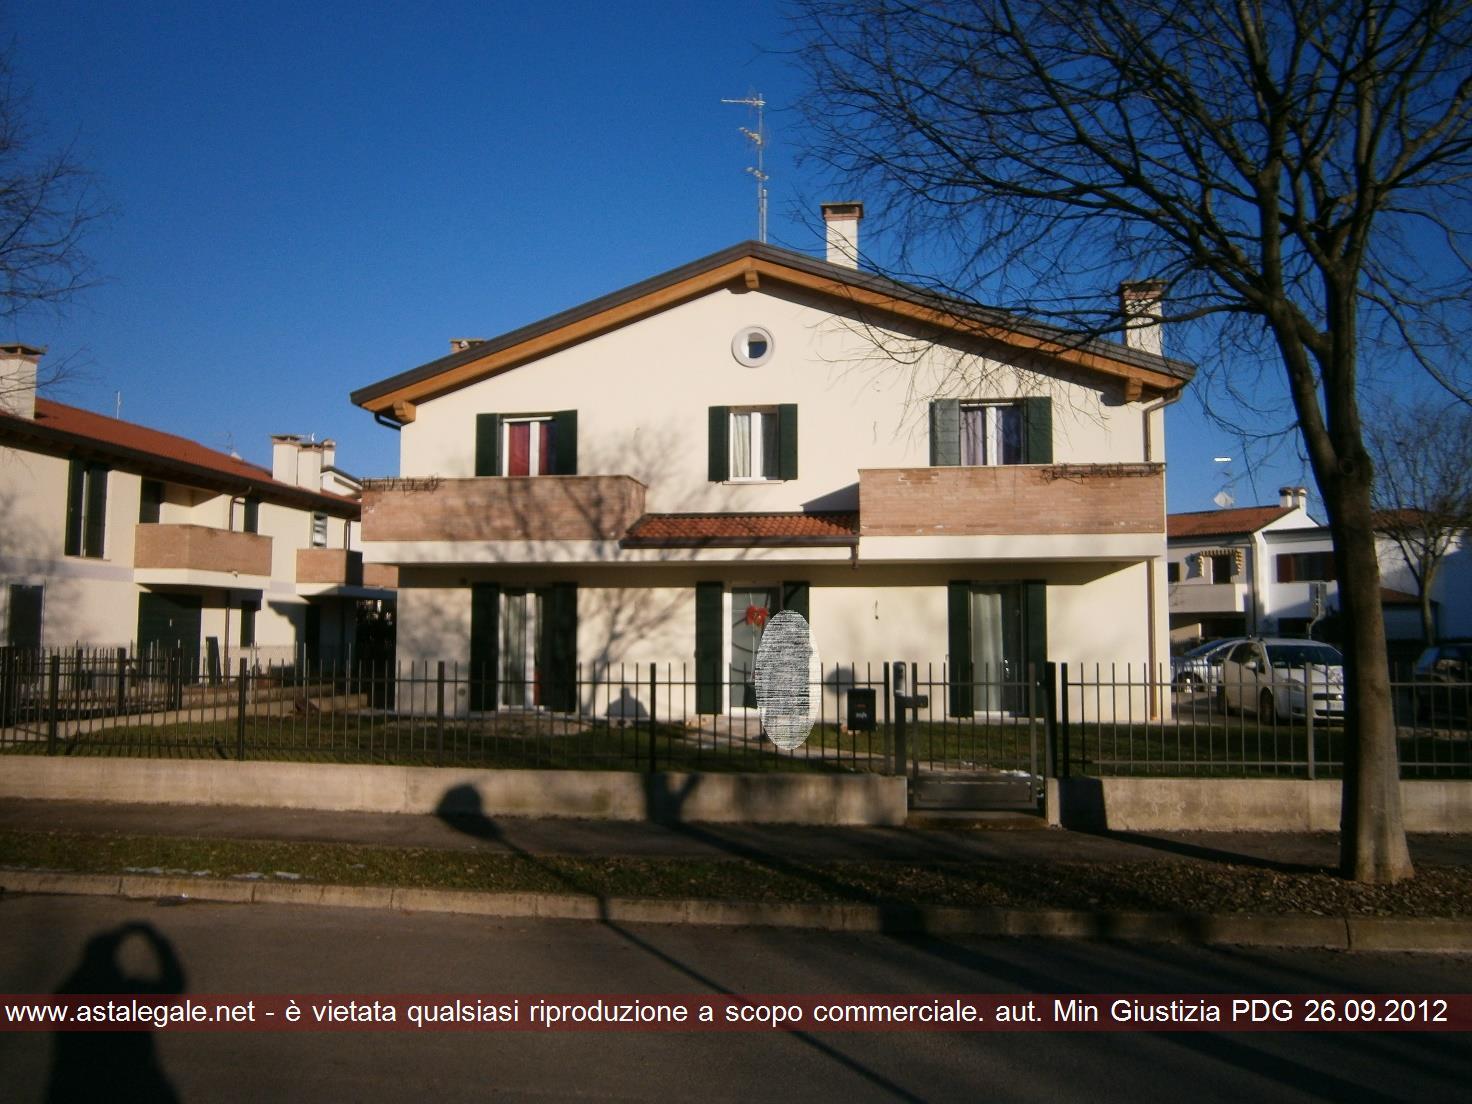 Teolo (PD) Via Antonio Carmignoto 20/B